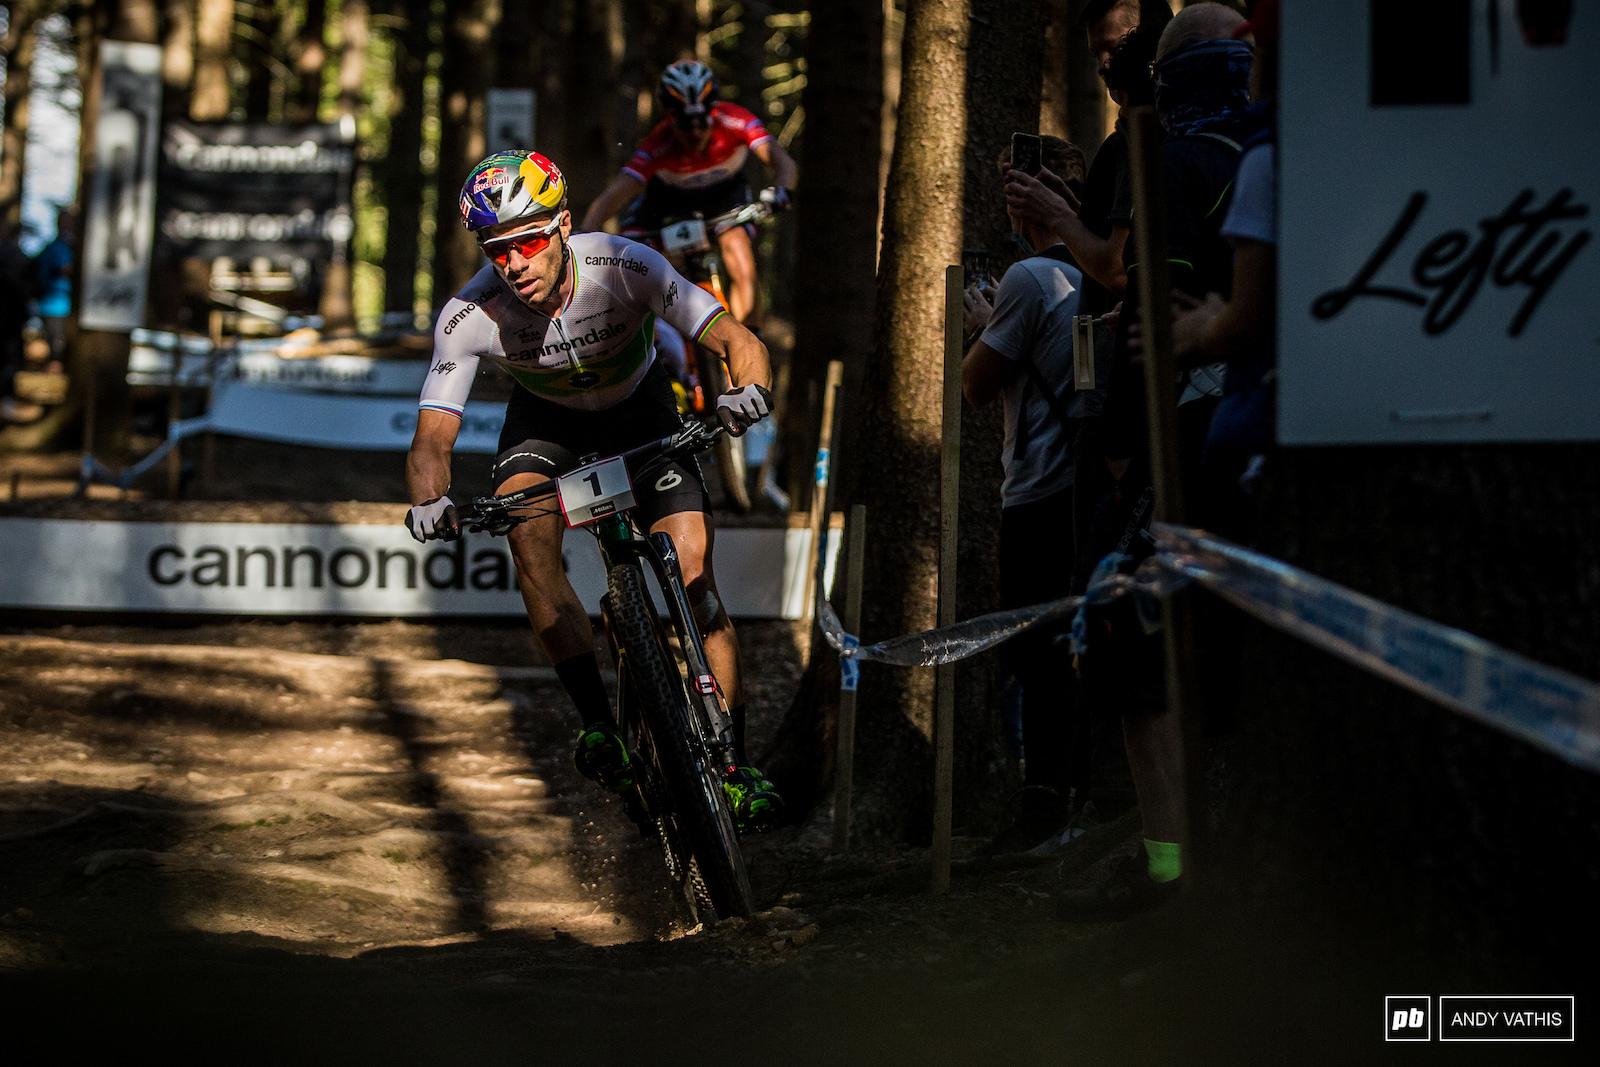 Avancini down the BMX section chasing Nino hard.